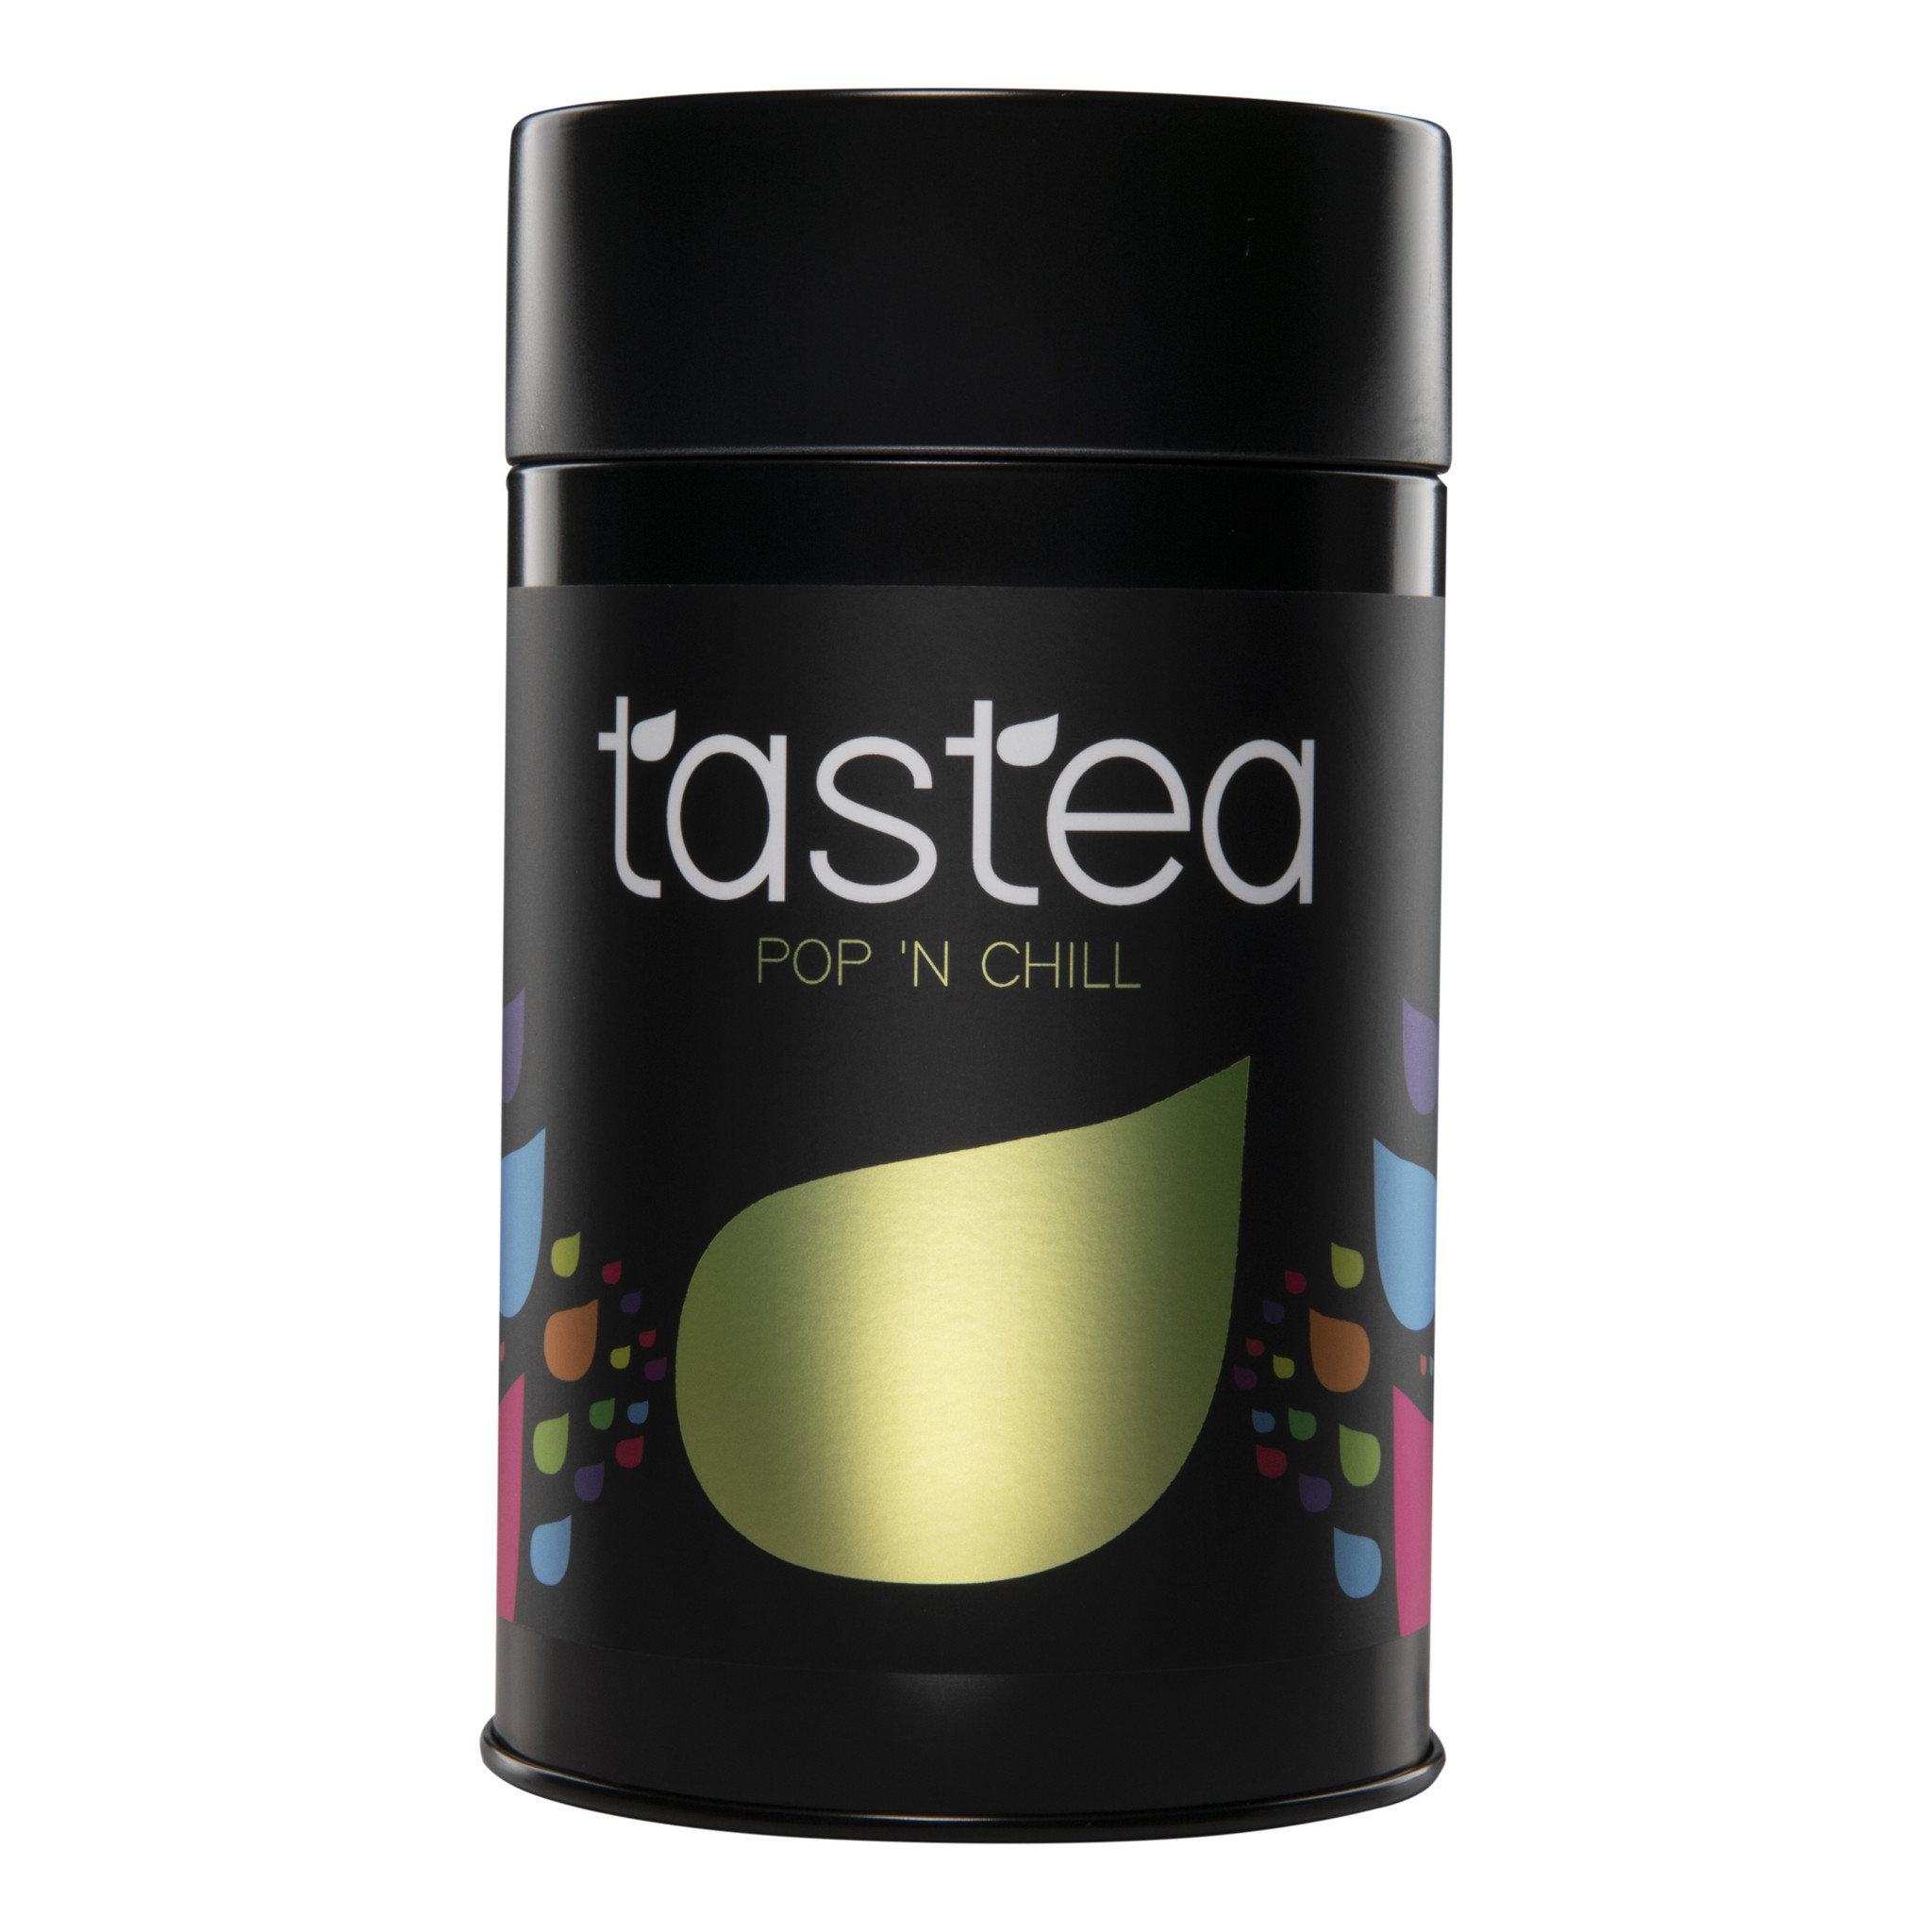 Tastea Pop 'N Chill thee 100 gram